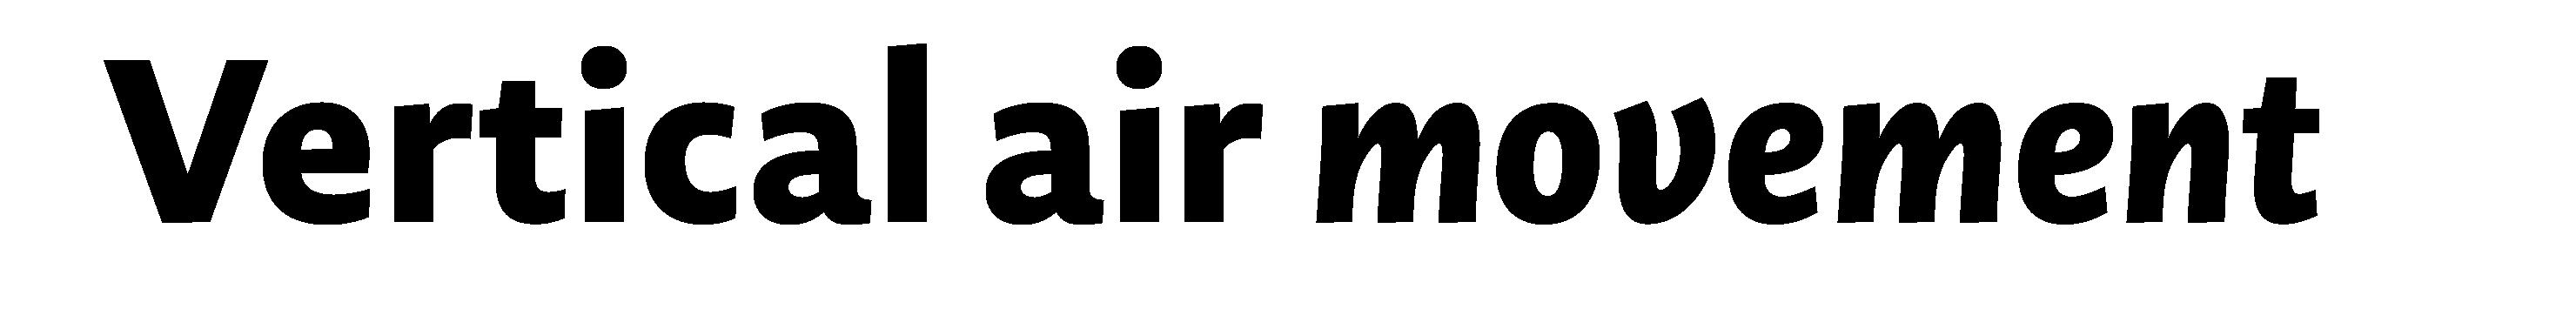 Typeface Novel Sans D06 Atlas Font Foundry